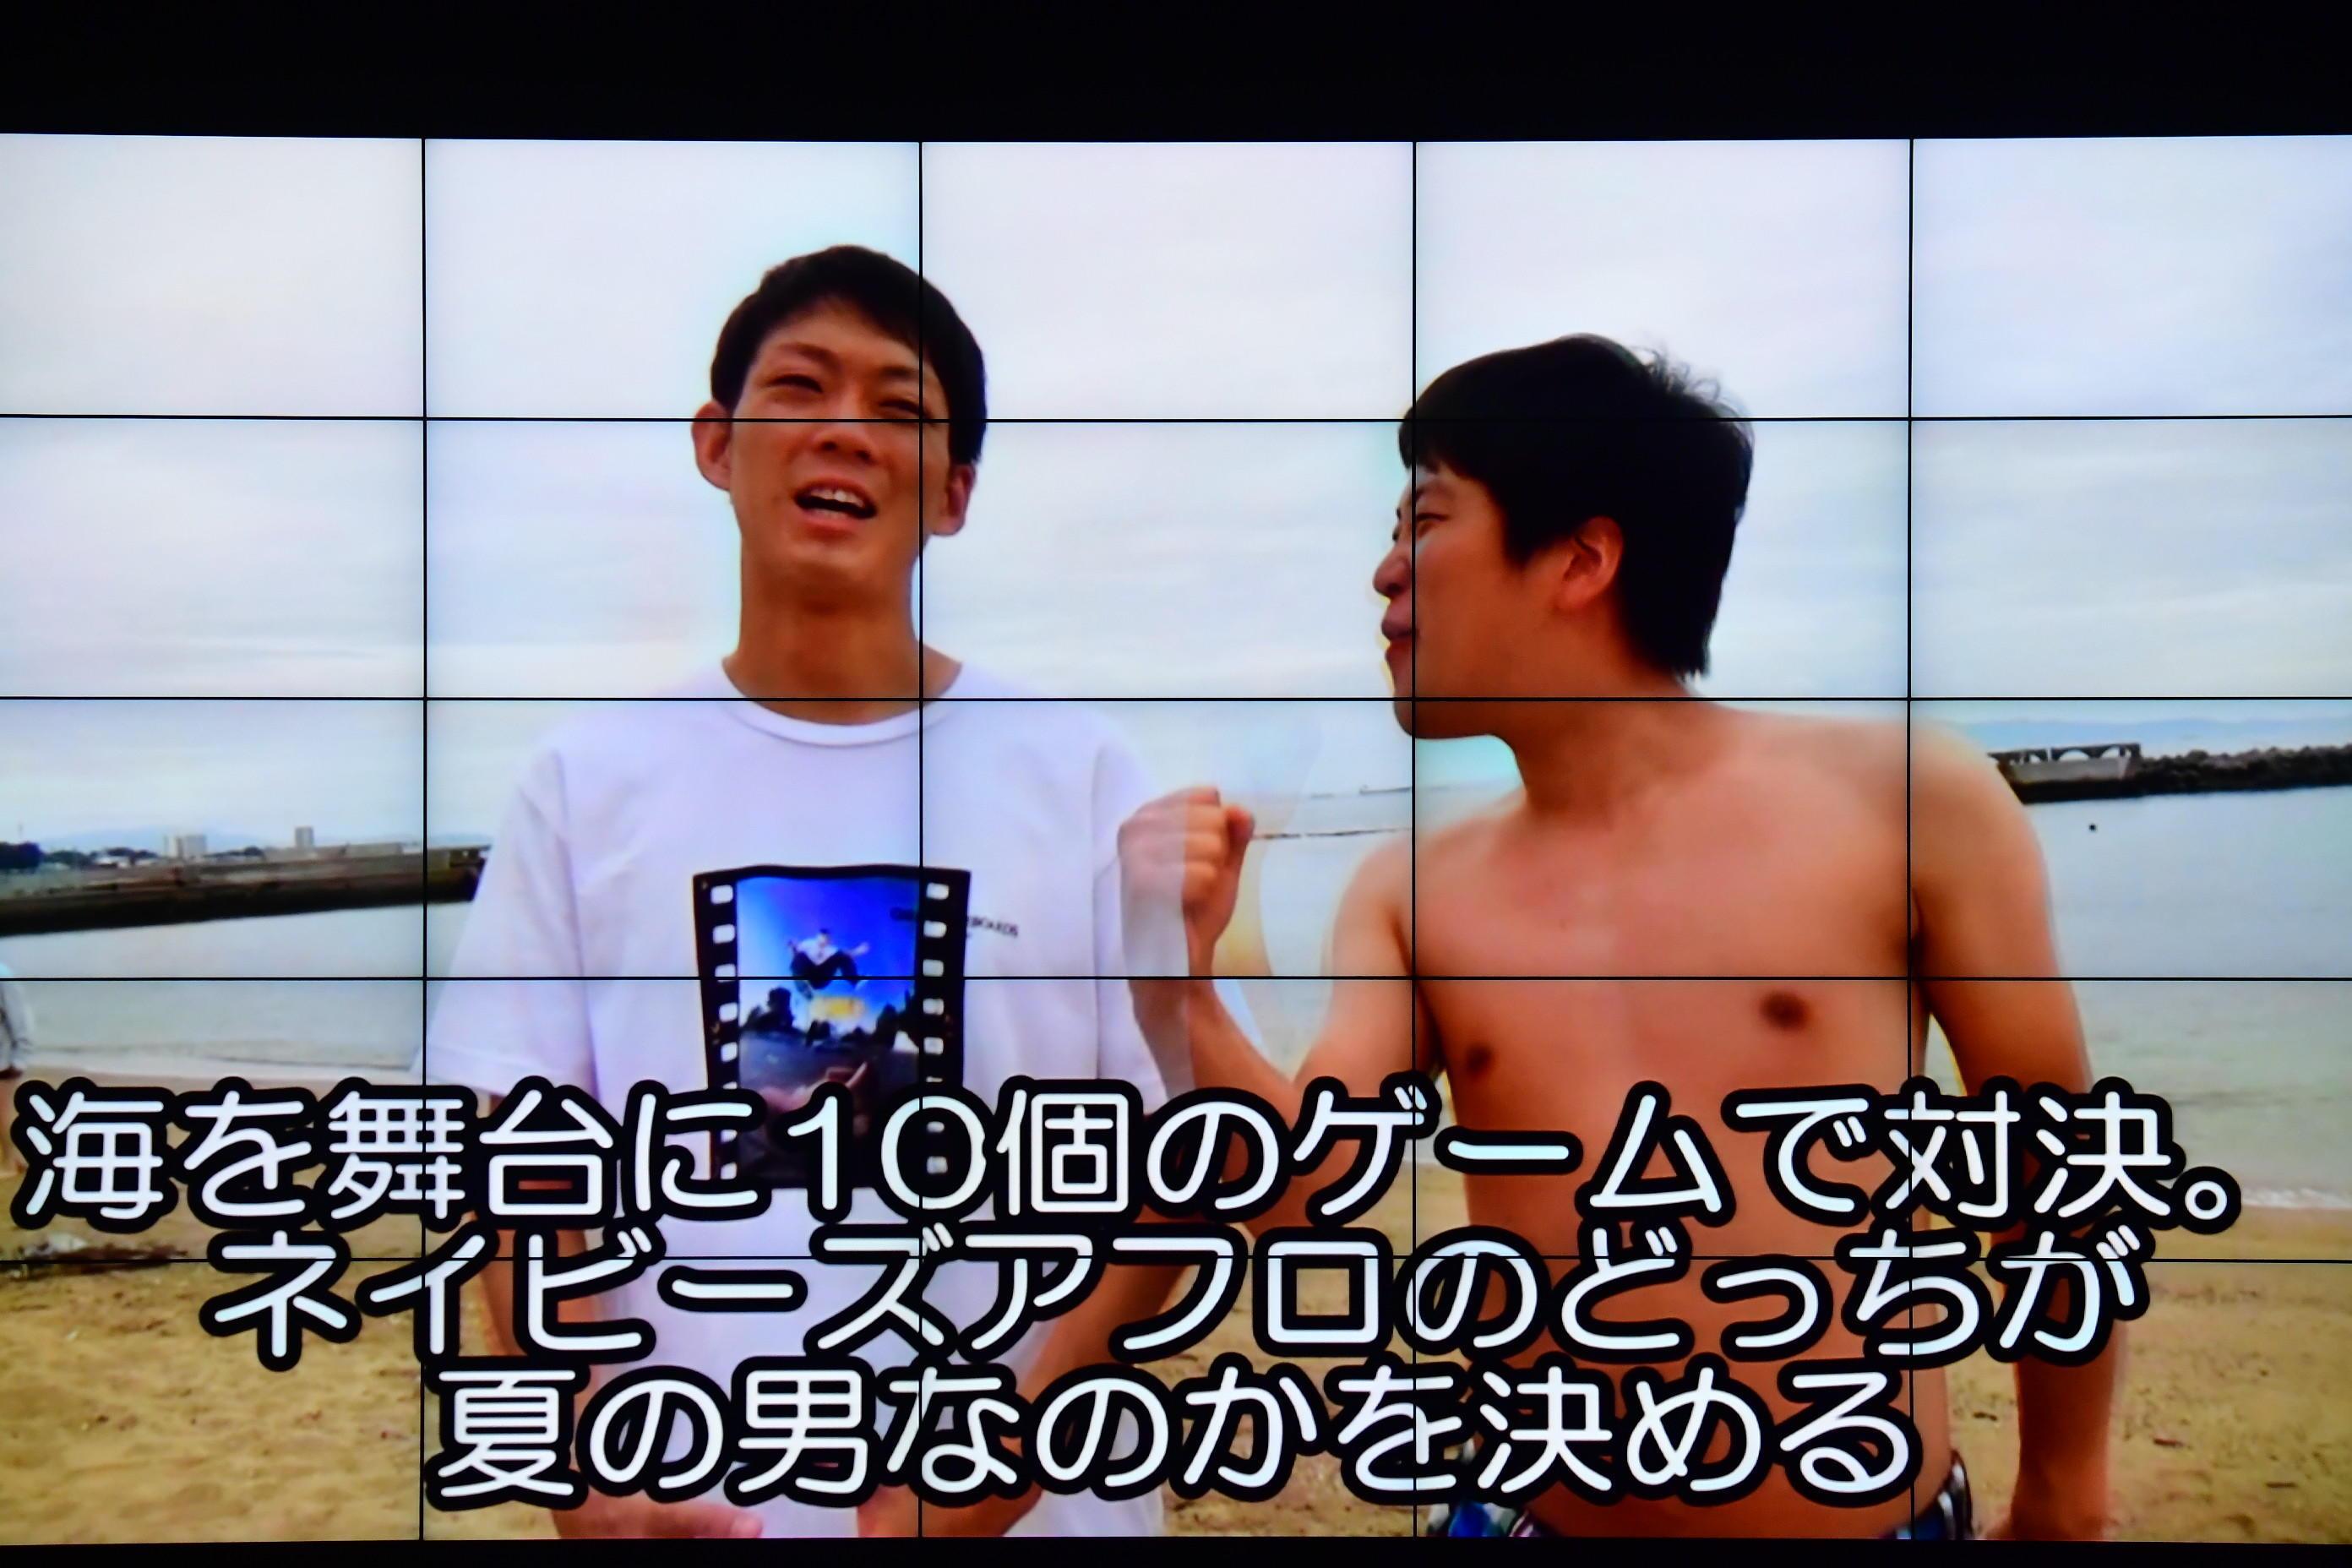 http://news.yoshimoto.co.jp/20180829234434-57958fdde79b8400728ea73fb9ca3a0c2f83e39d.jpg